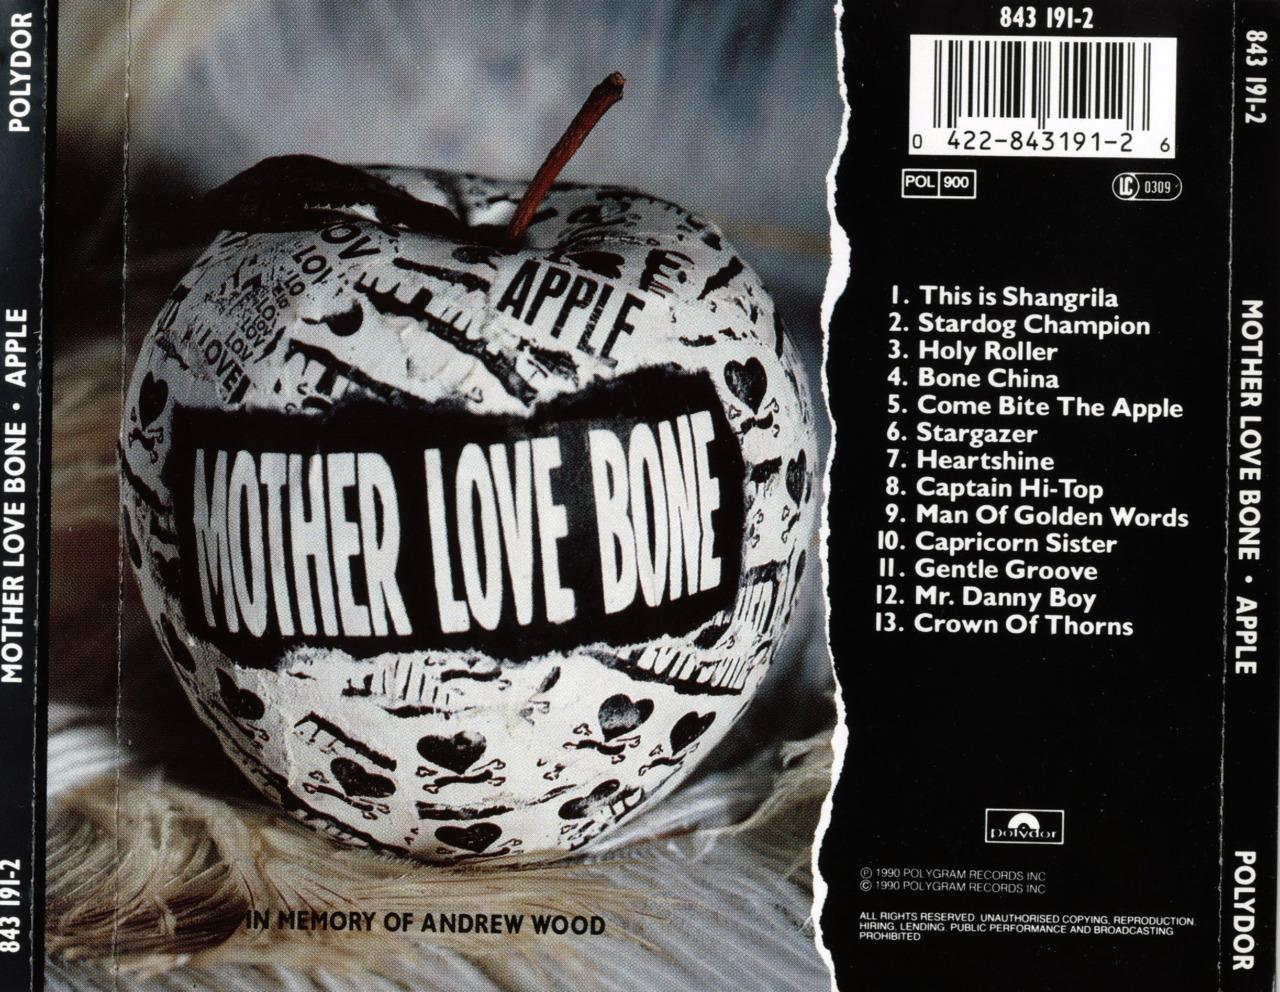 MOTHER LOVE BONE, Apple disco 10 Tumblr_m40t3hFNwK1qcqnq5o2_1280